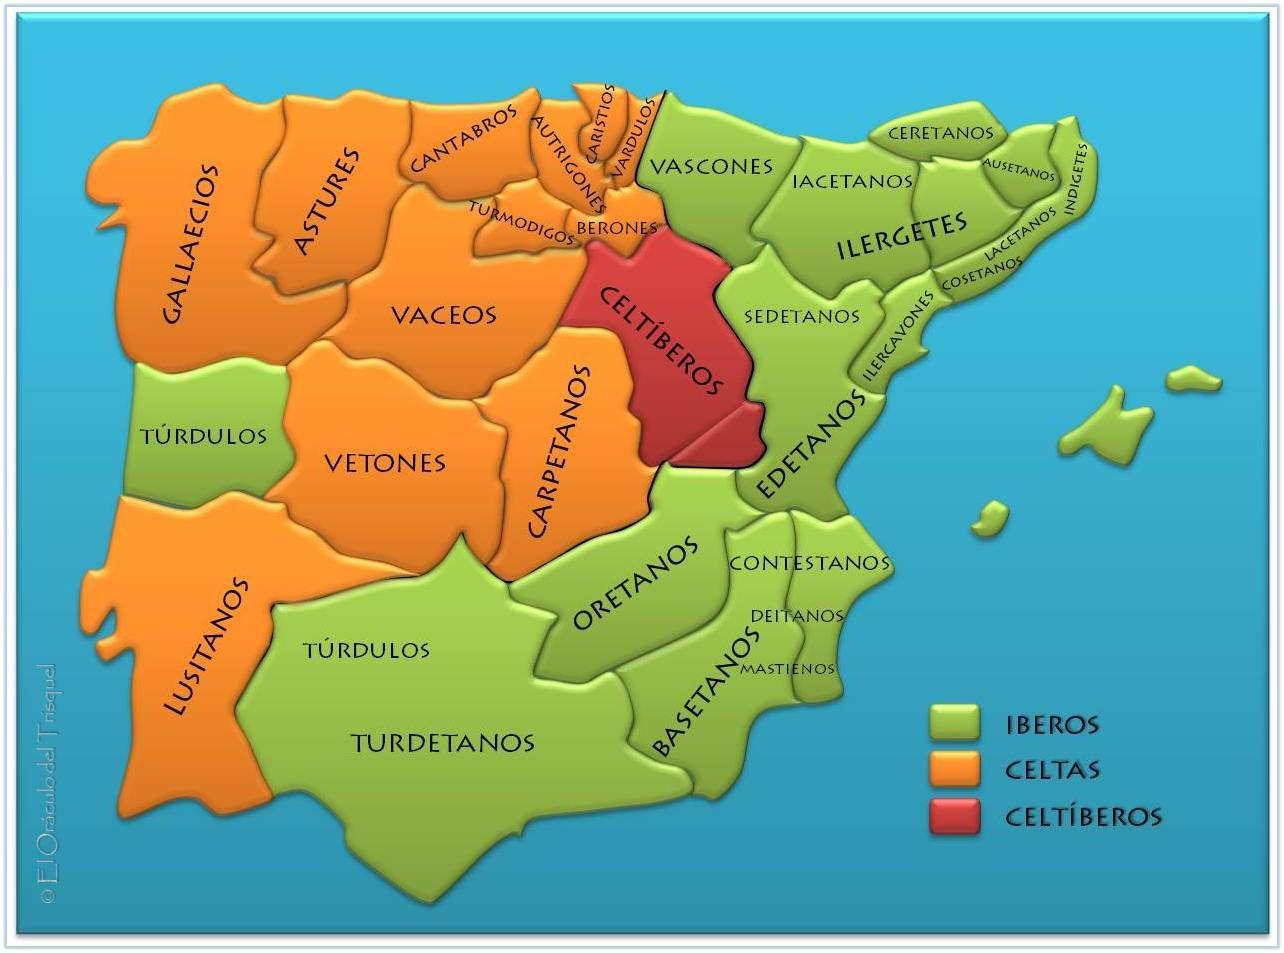 Mapa Peninsula Iberica Pre Romana Mapa Mapa Mundi Mapas Historicos